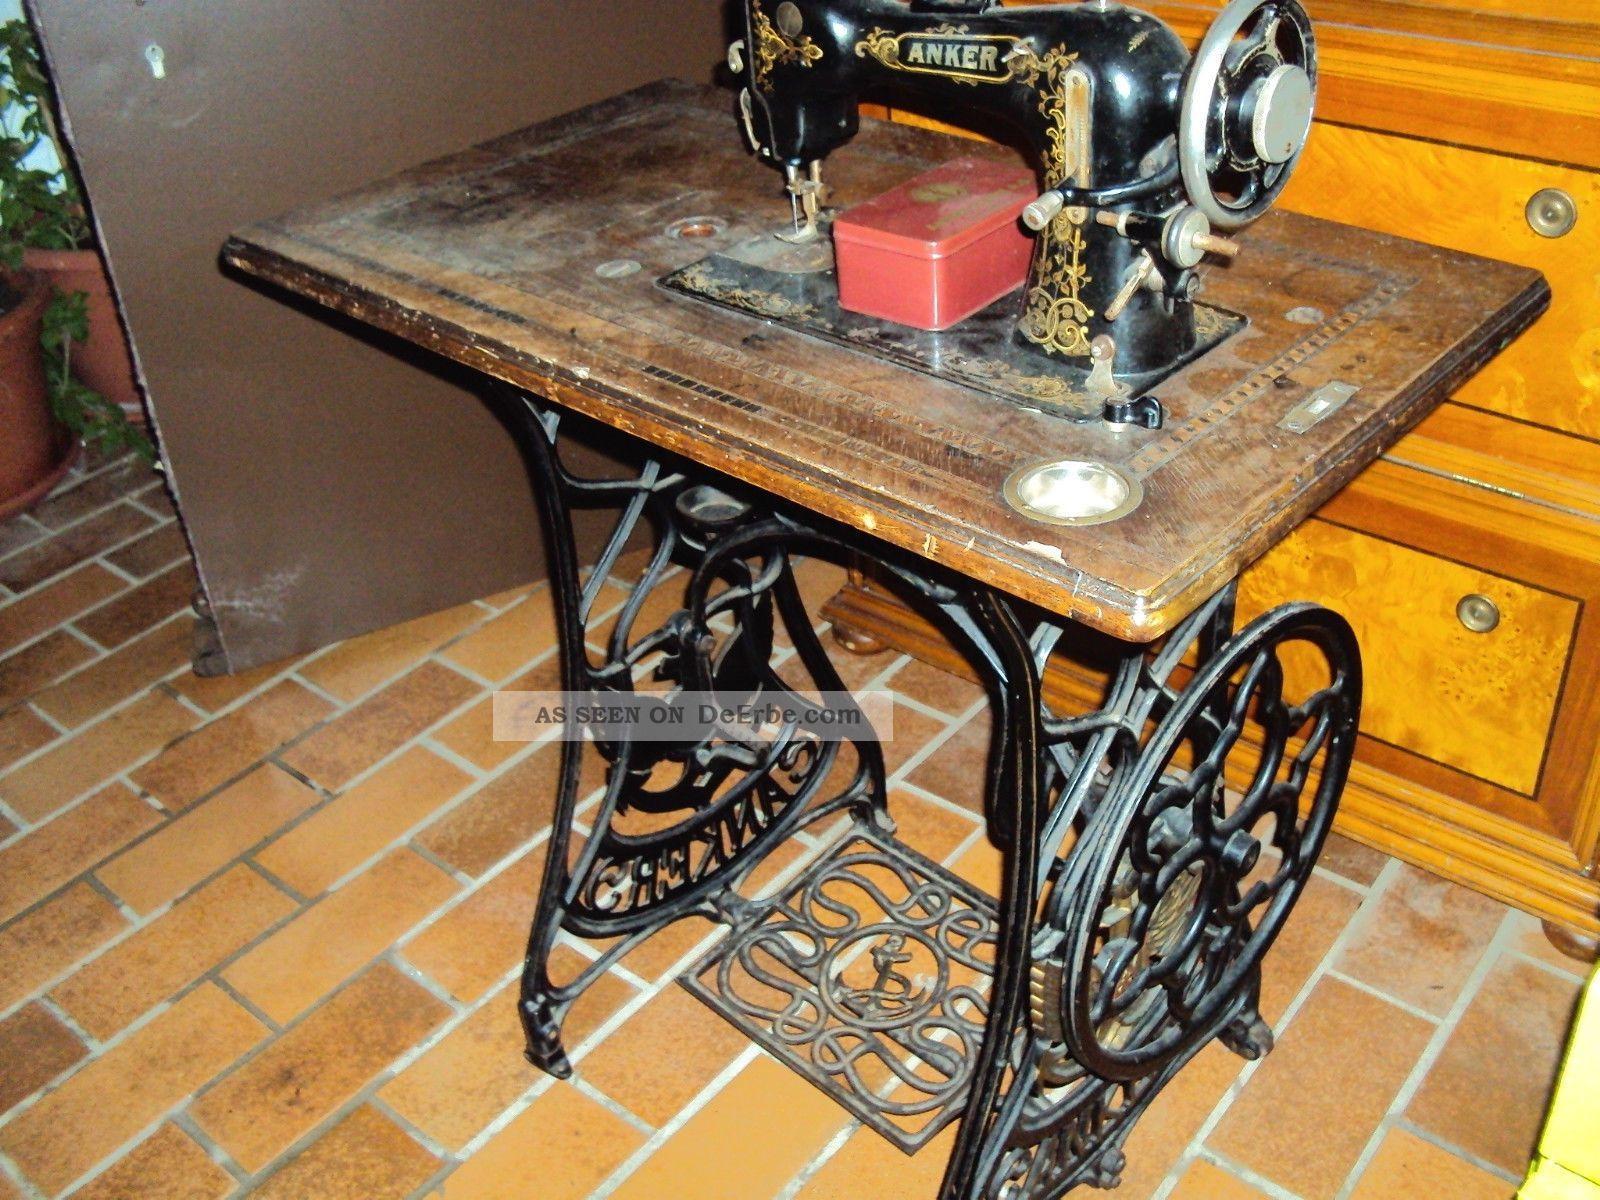 alte n hmaschine von anker. Black Bedroom Furniture Sets. Home Design Ideas